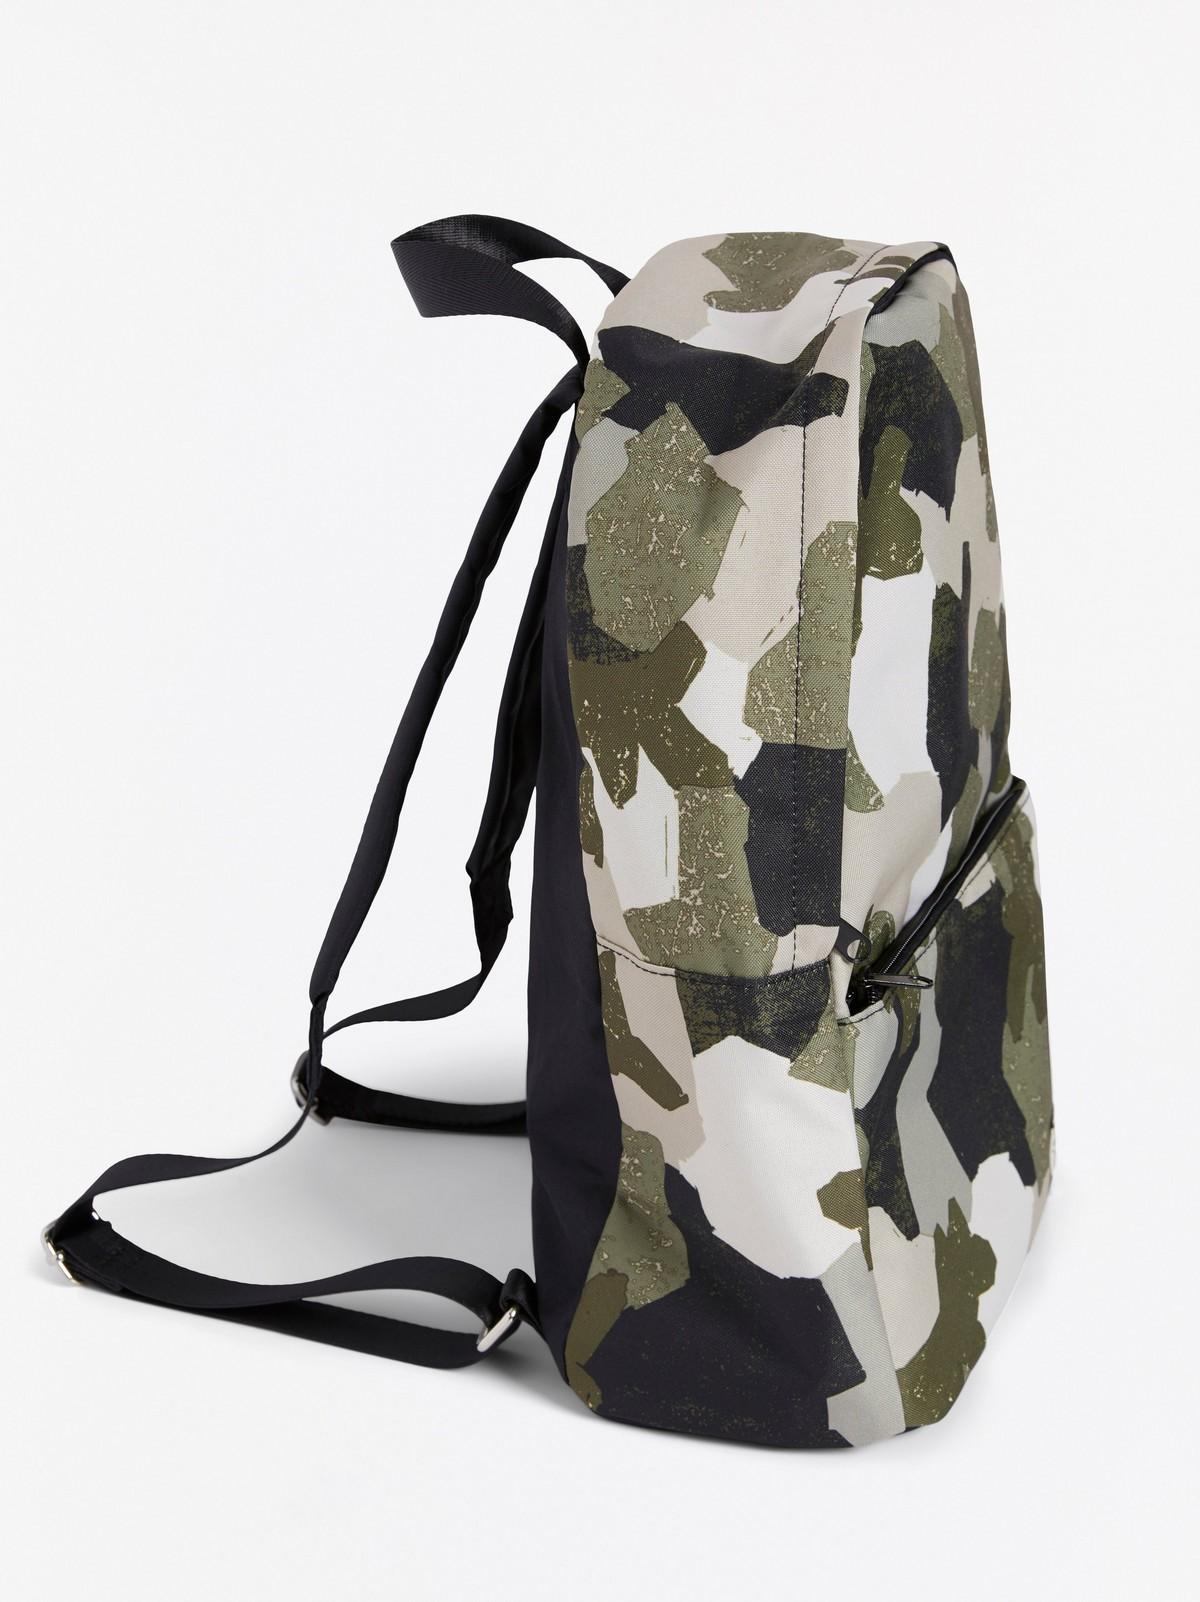 Ryggsäck med camouflage mönster